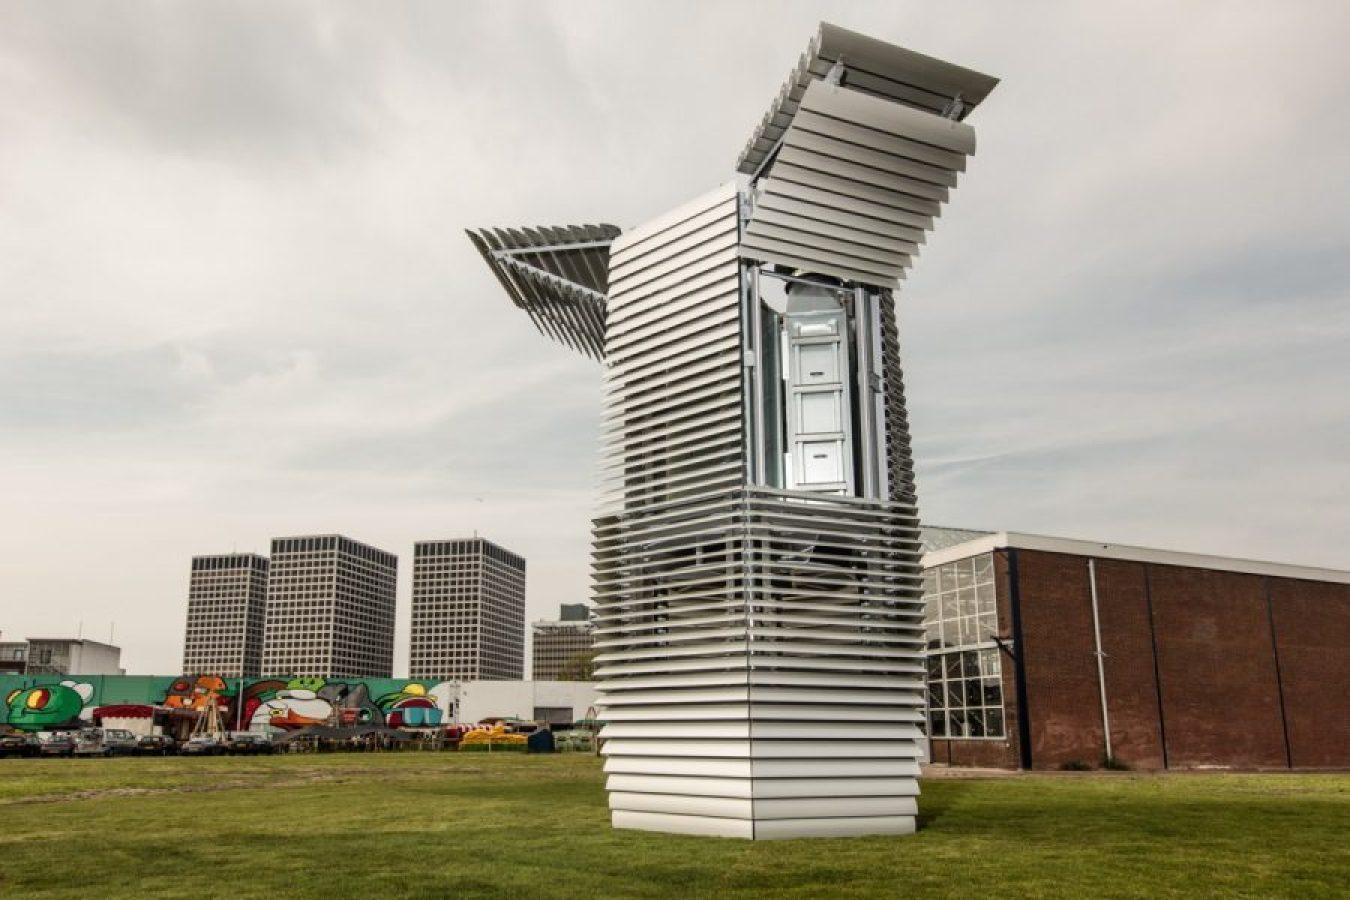 smog-free-tower-leci-do-pekinu-chce-uwolnic-chiny-od-smogu